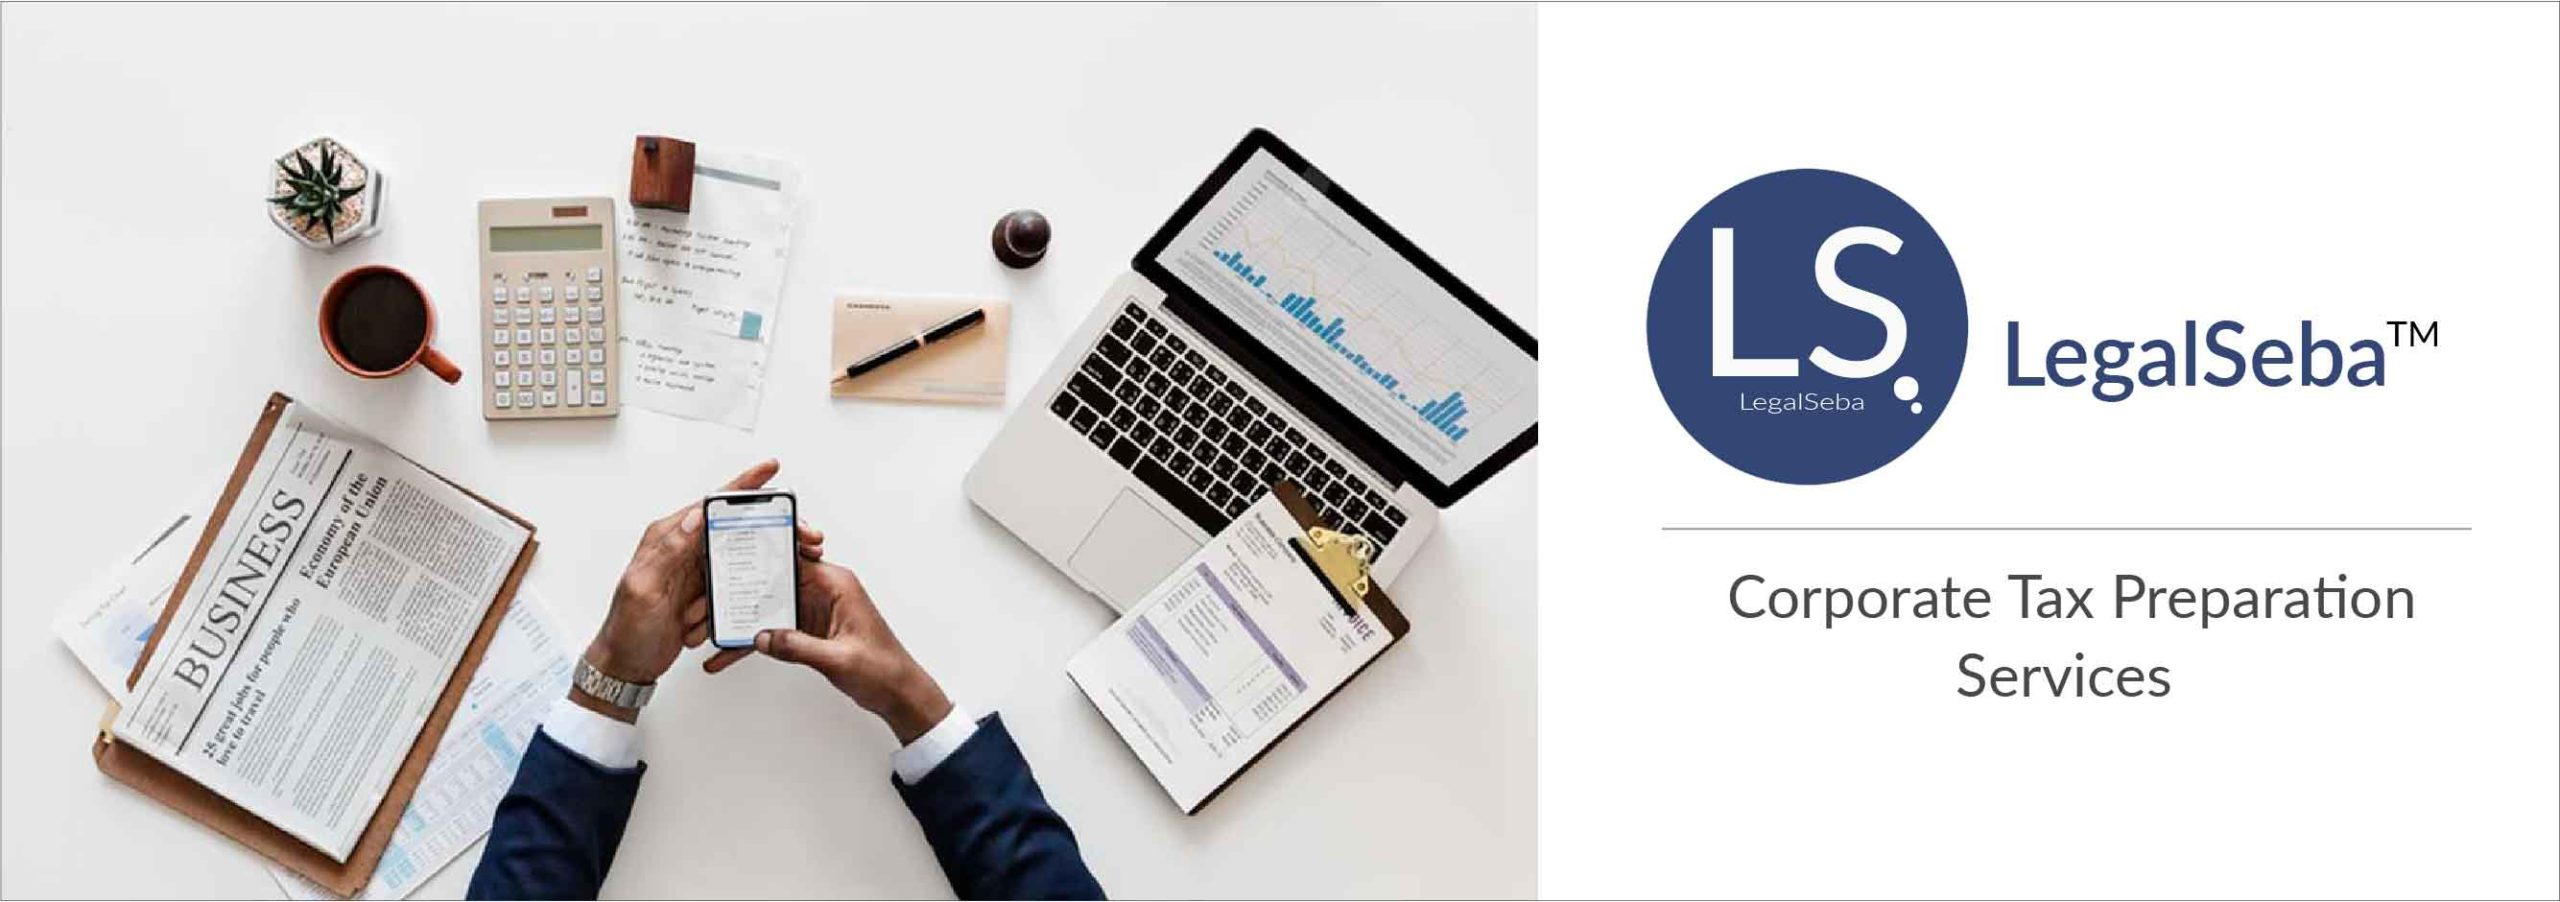 Corporate Tax Preparation Services